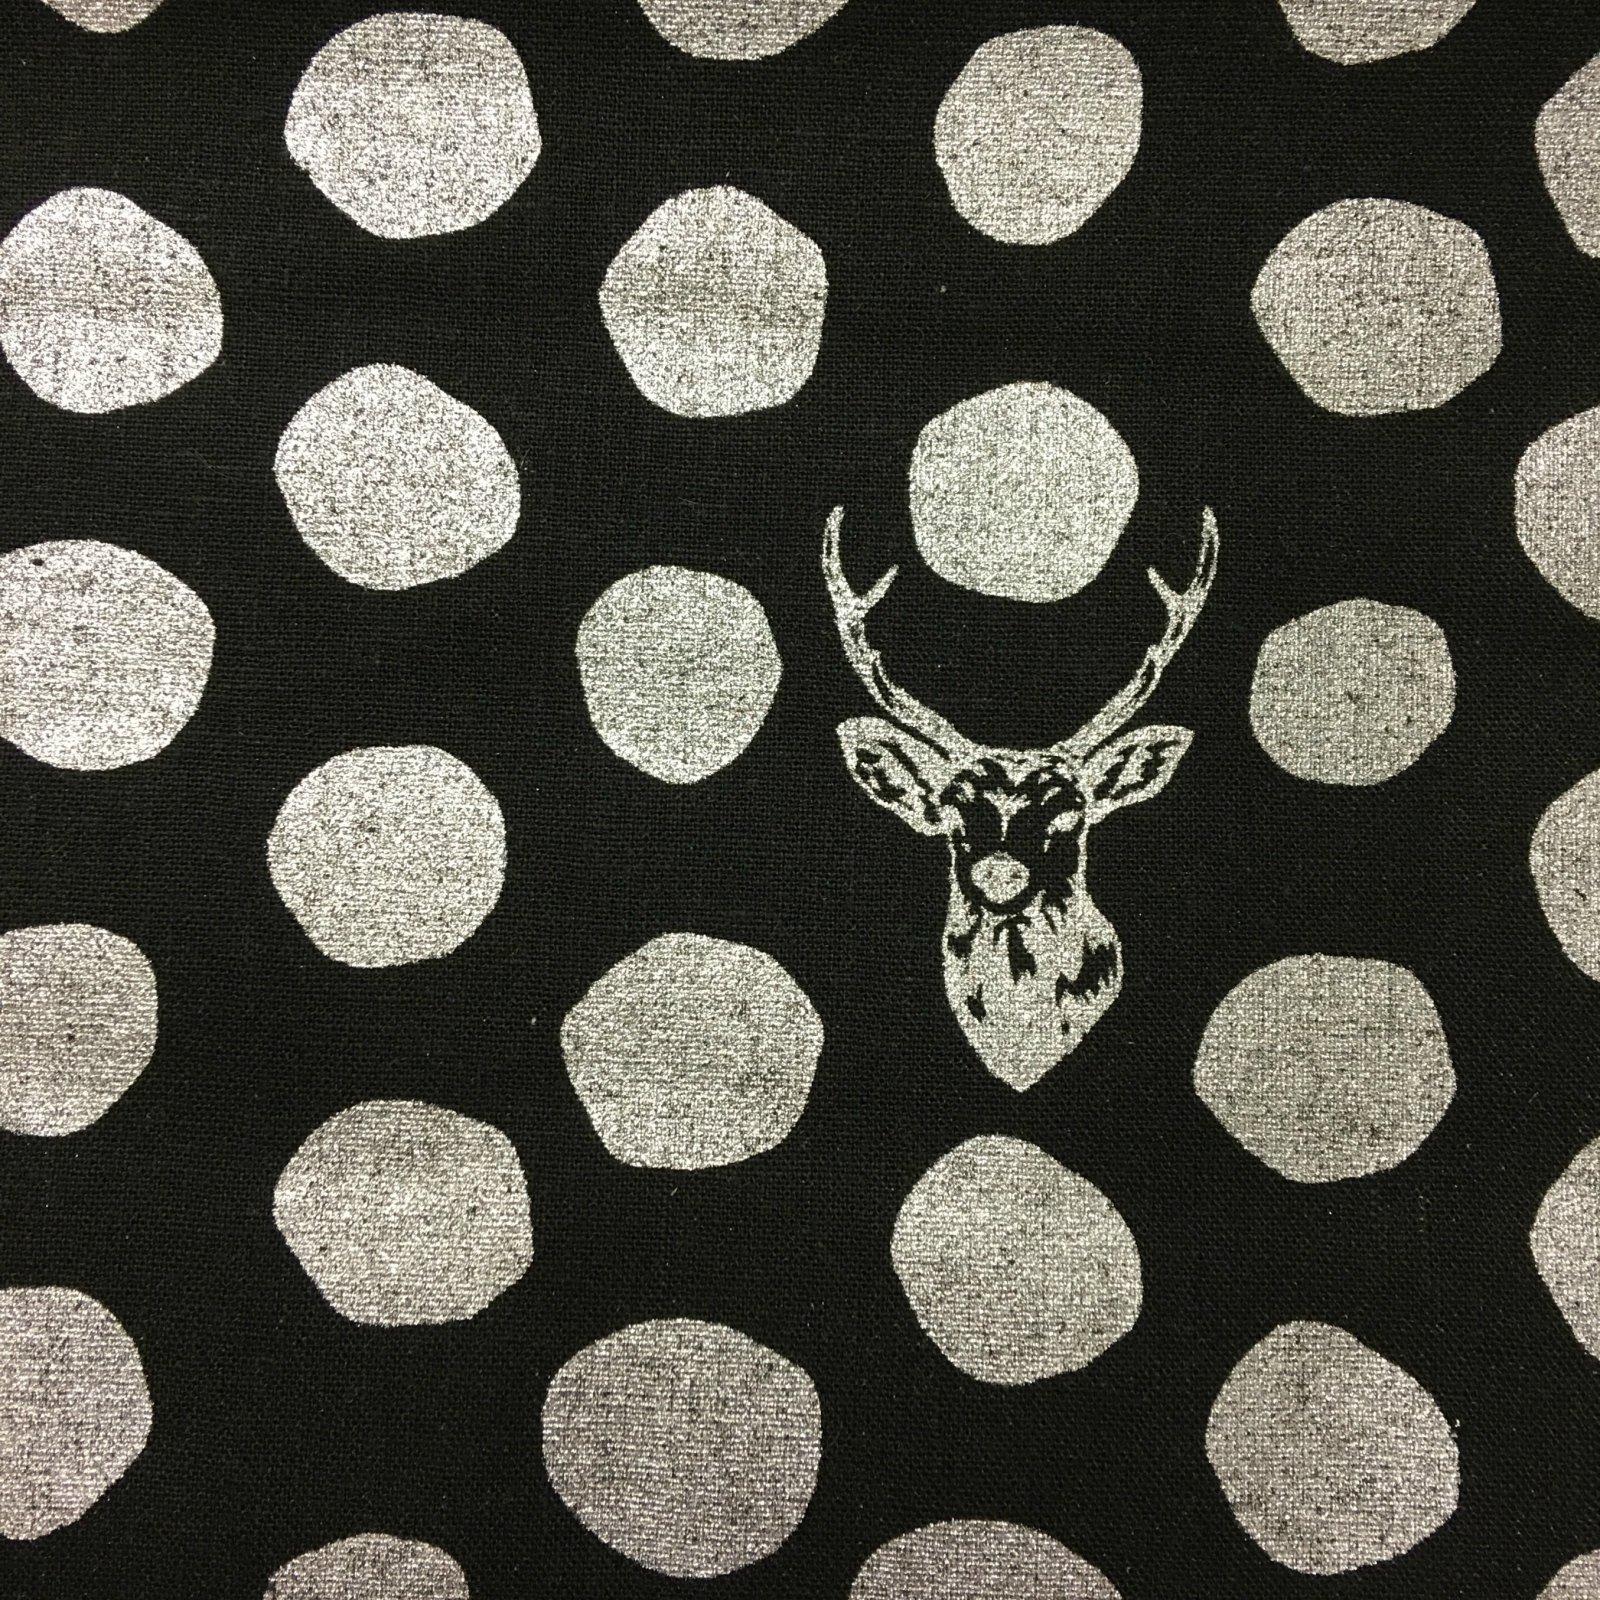 Echino - Dots - Metallic Silver/Black